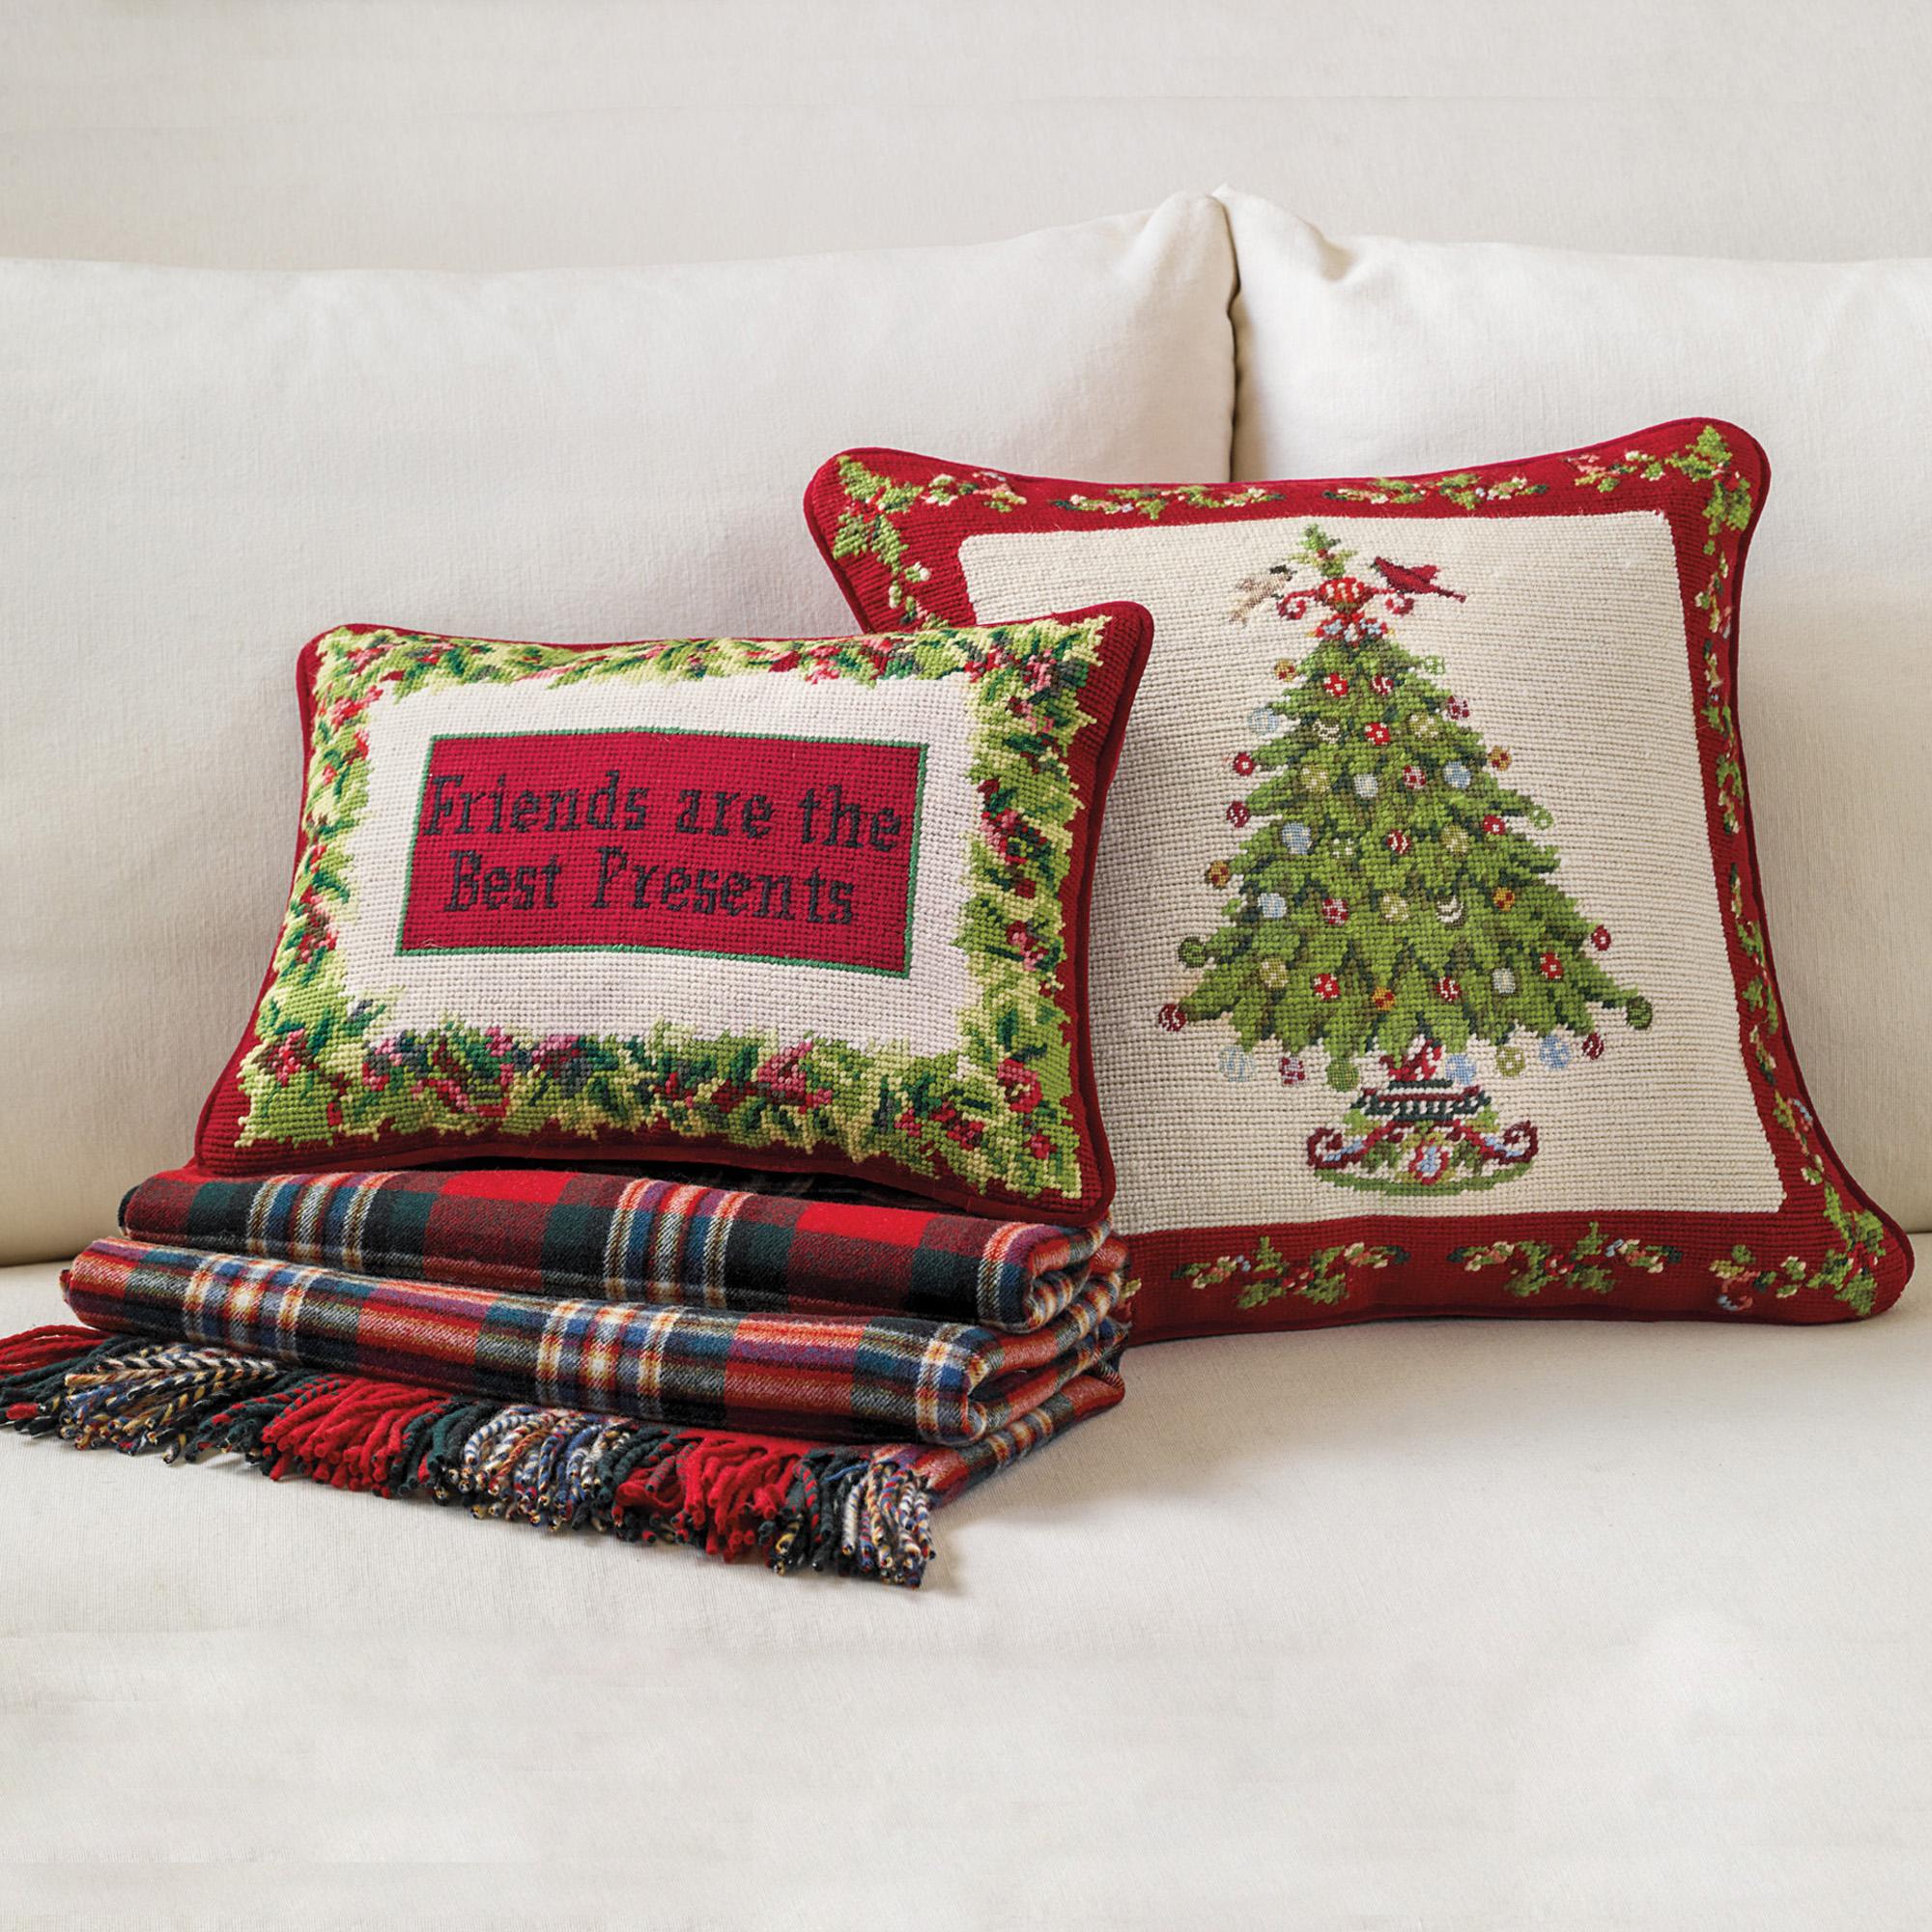 Festive Needlepoint PillowsGumps